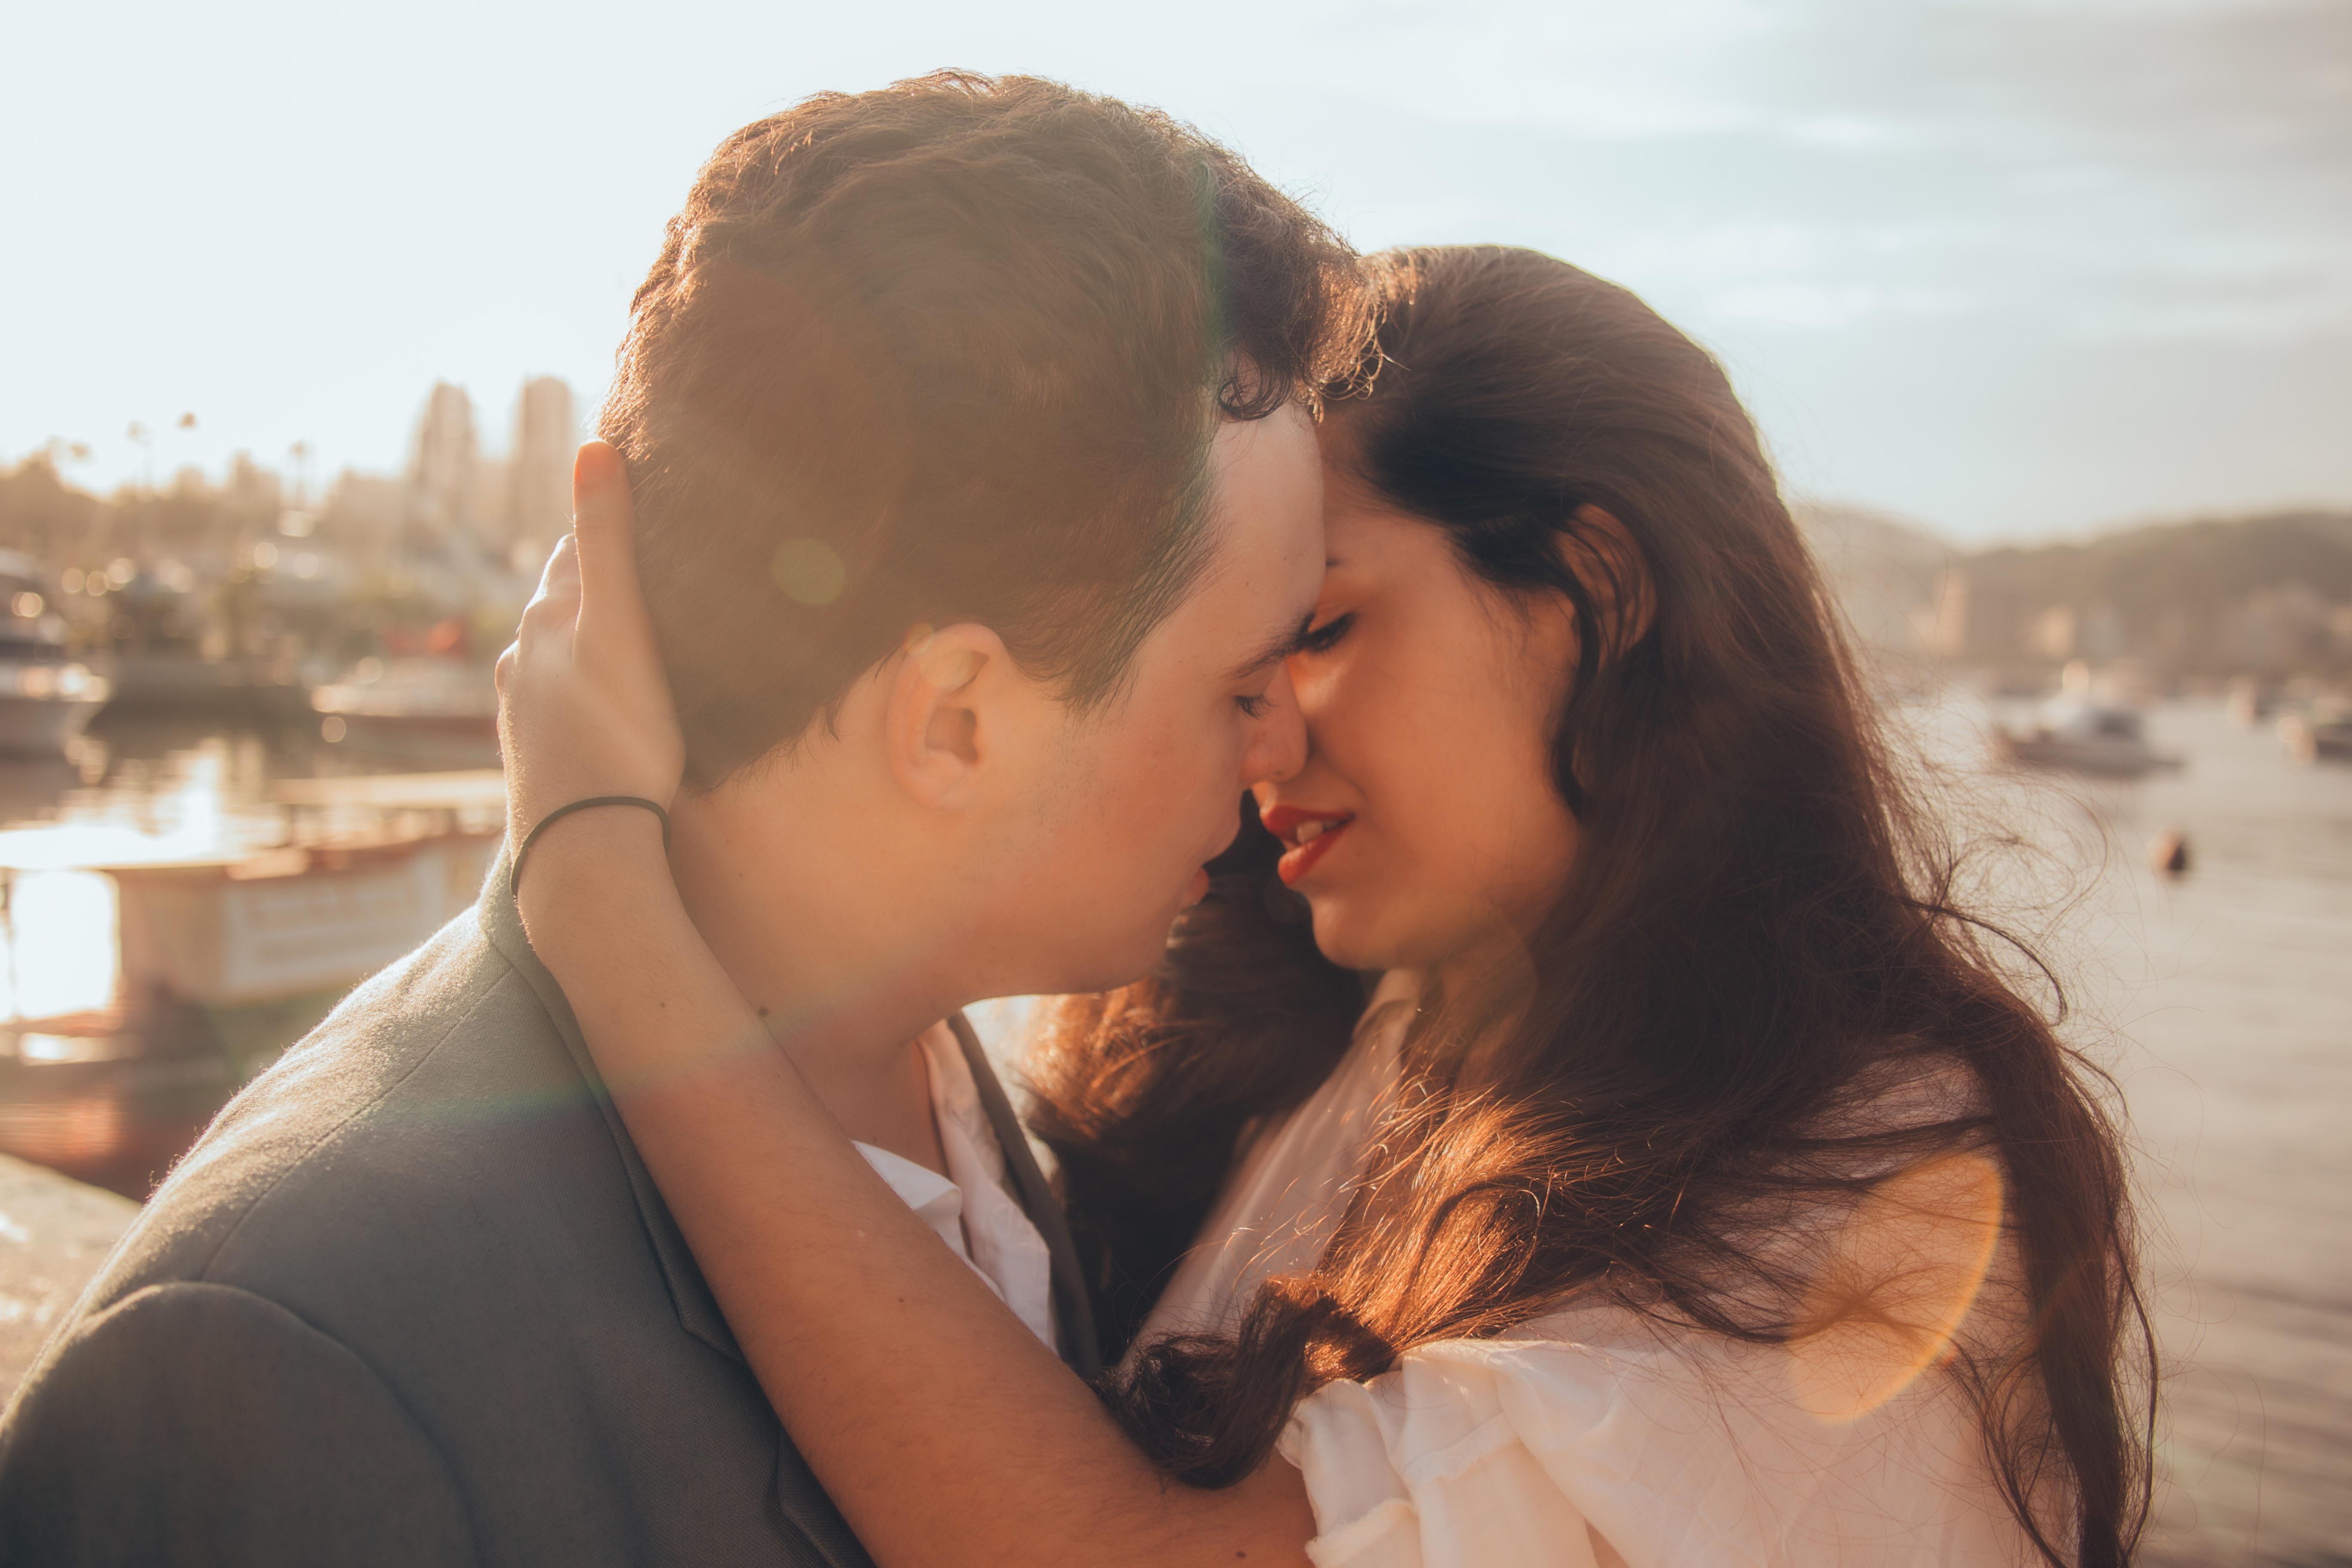 молодая пара целуется фото